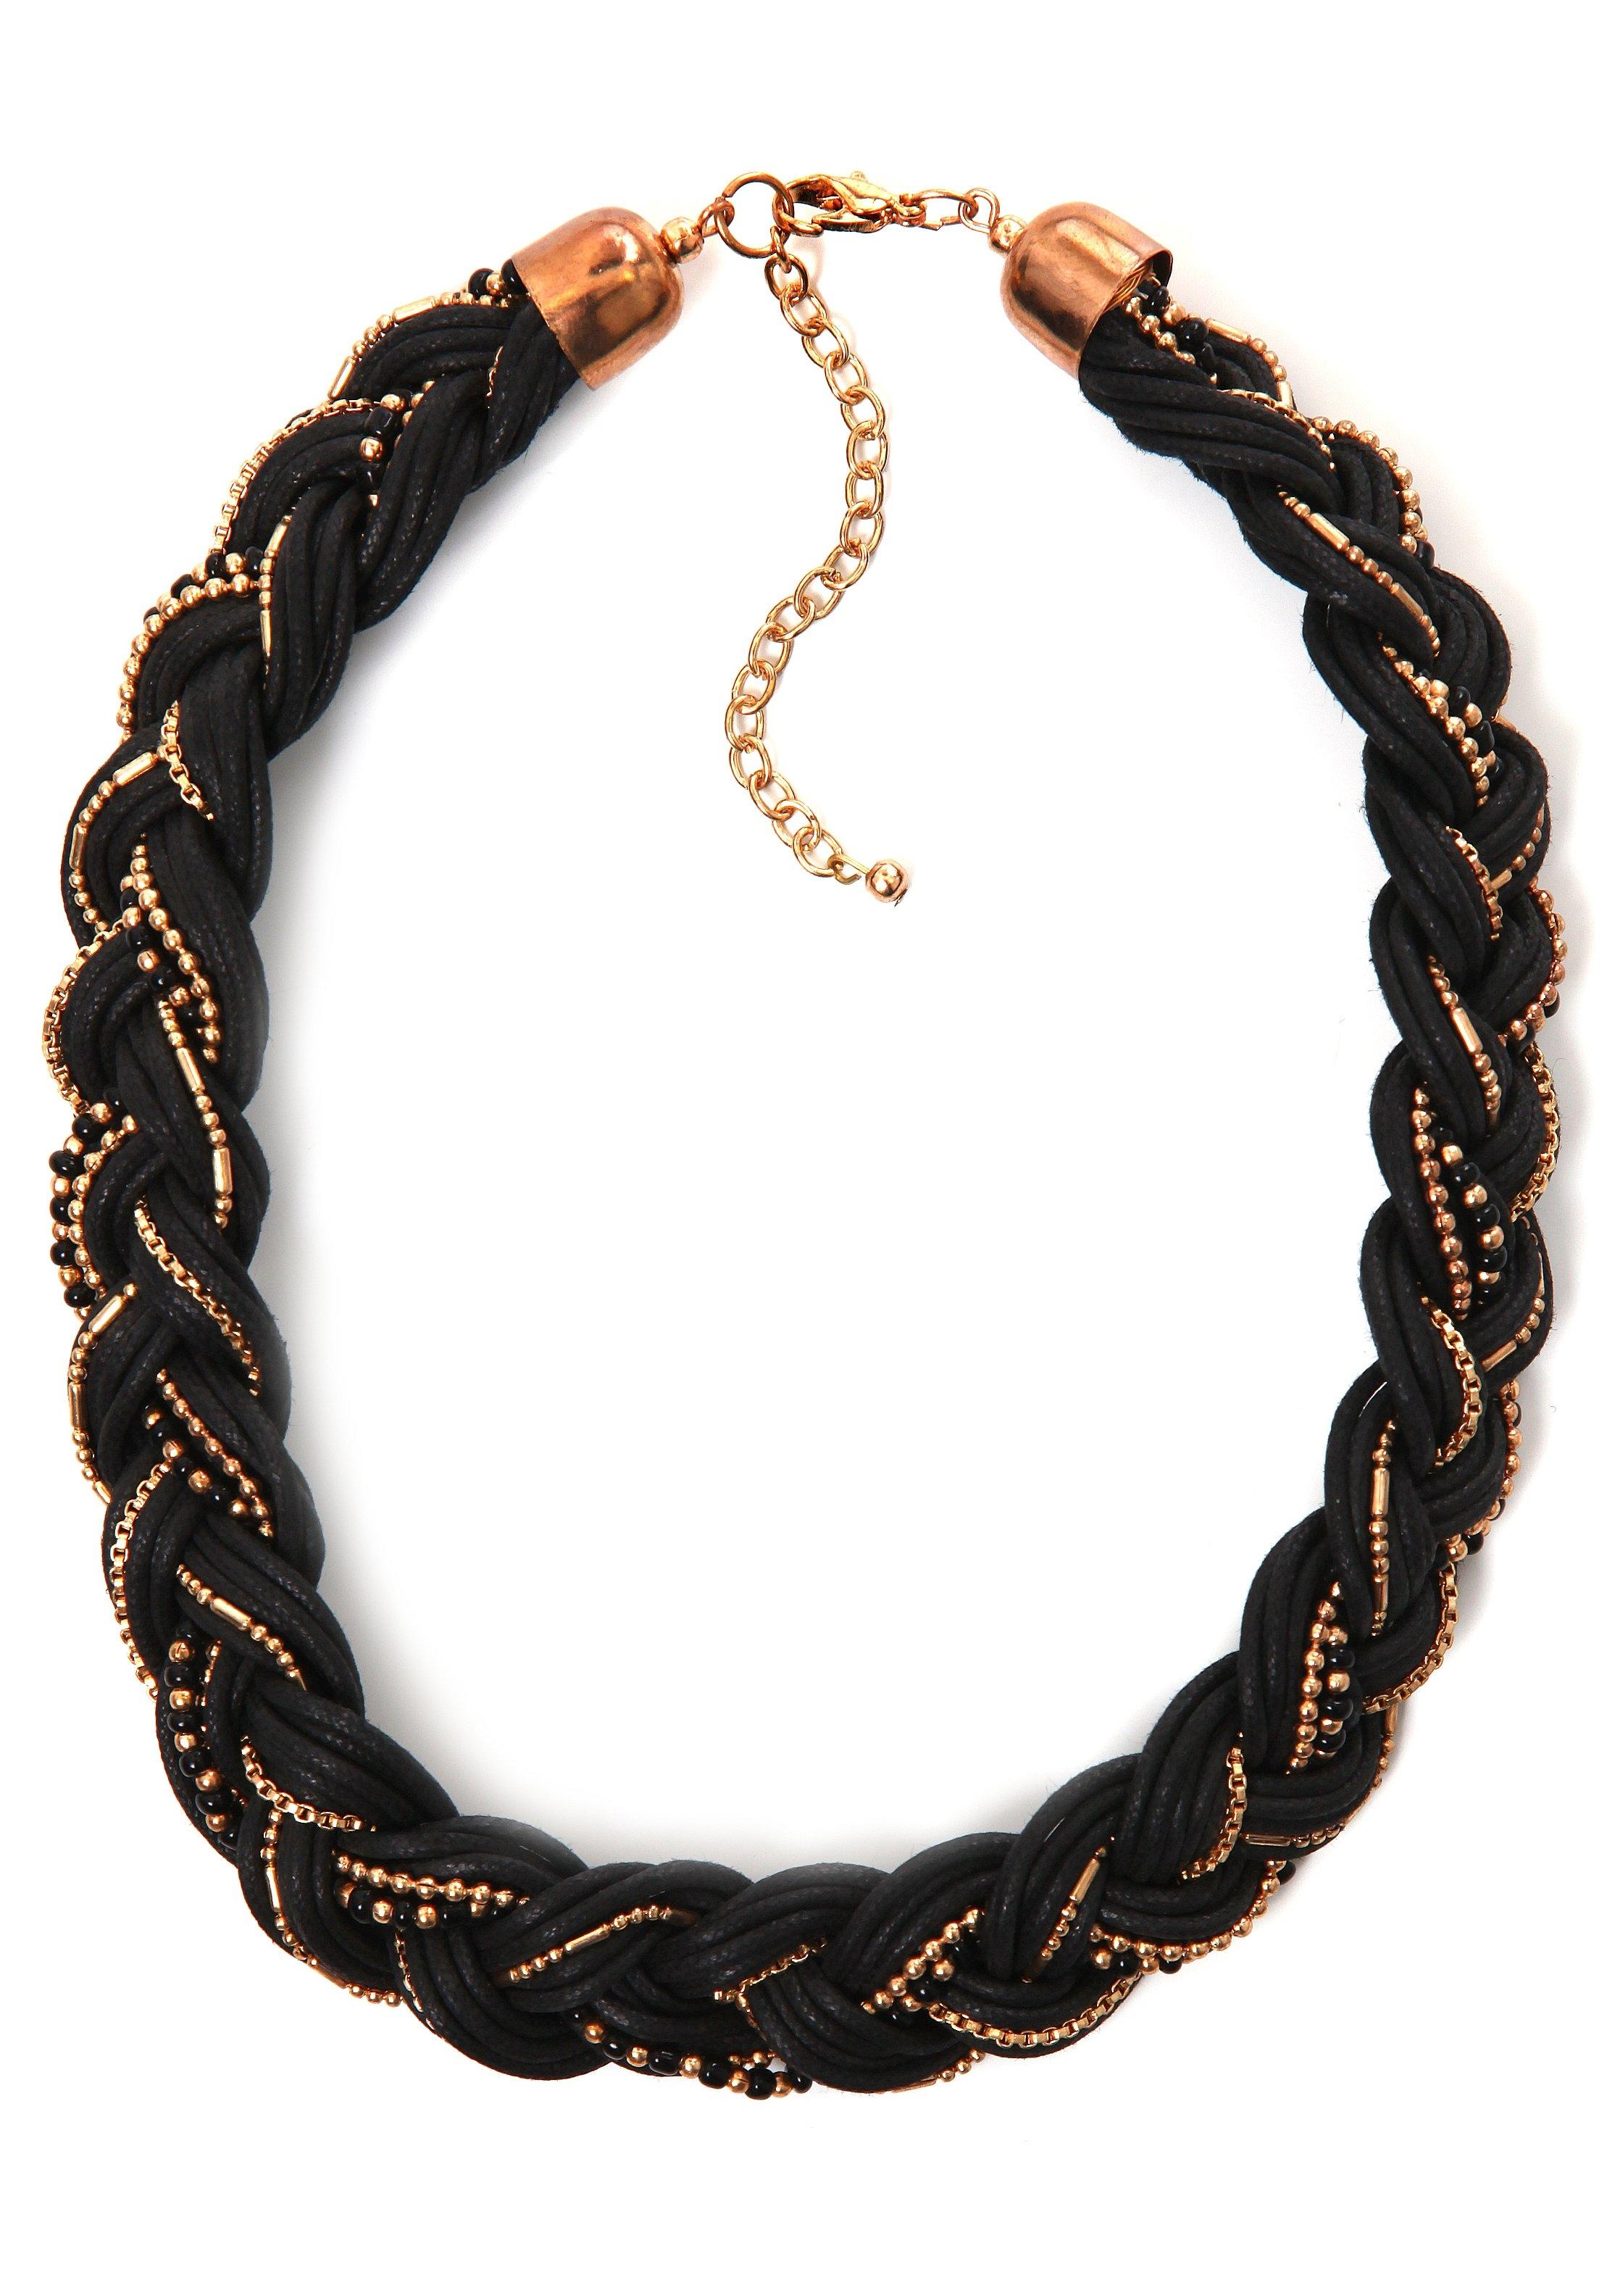 COLLEZIONE ALESSANDRO collier C2297-F01-101 met glaskralen online kopen op otto.nl